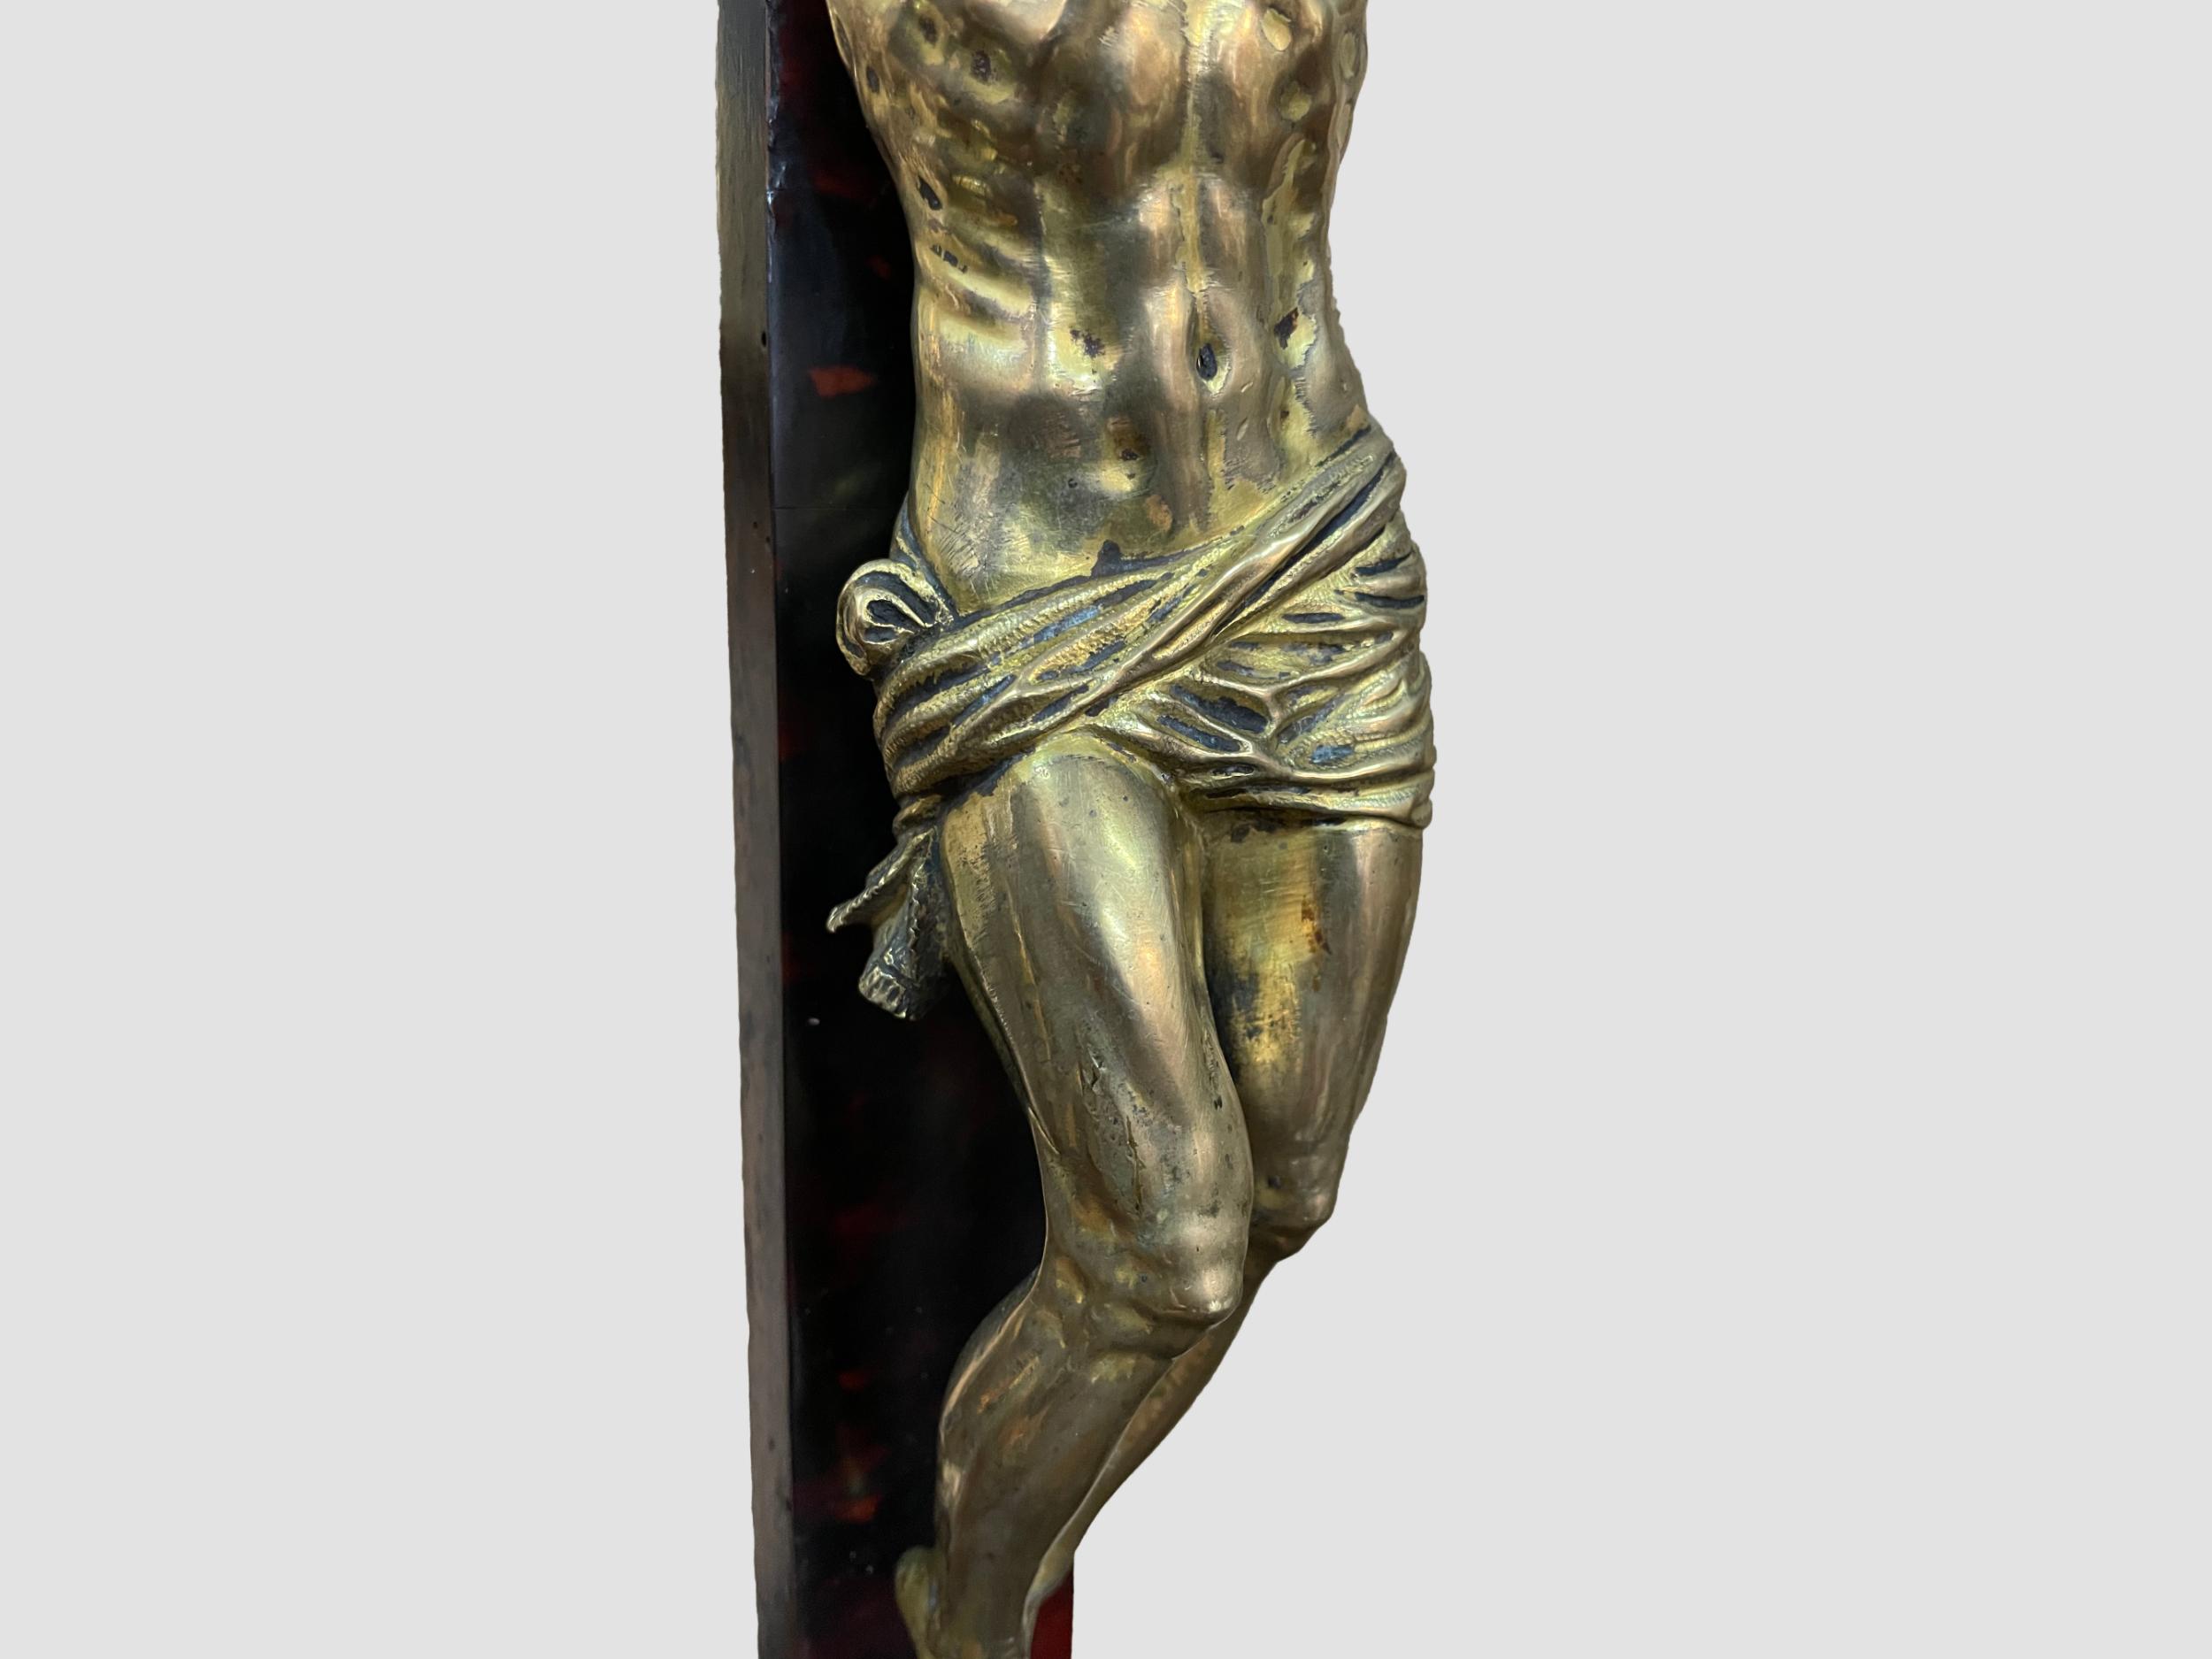 Corpus Christi, Savero da Ravenna 1496-1538 (Umkreis), Bronze - Image 9 of 9